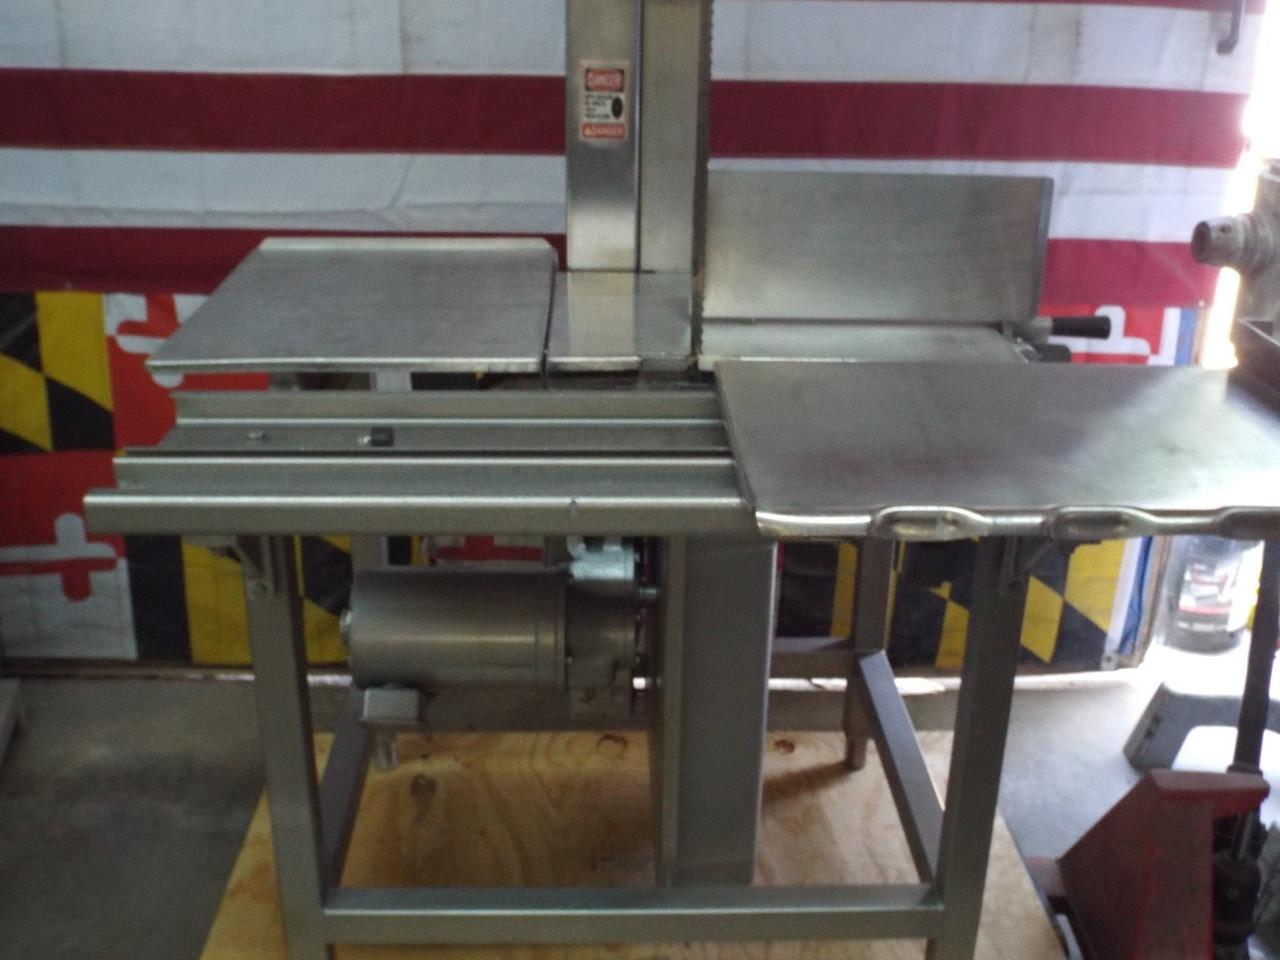 Hobart Deli Meat Saw Model 5801 Rebuilt 3P